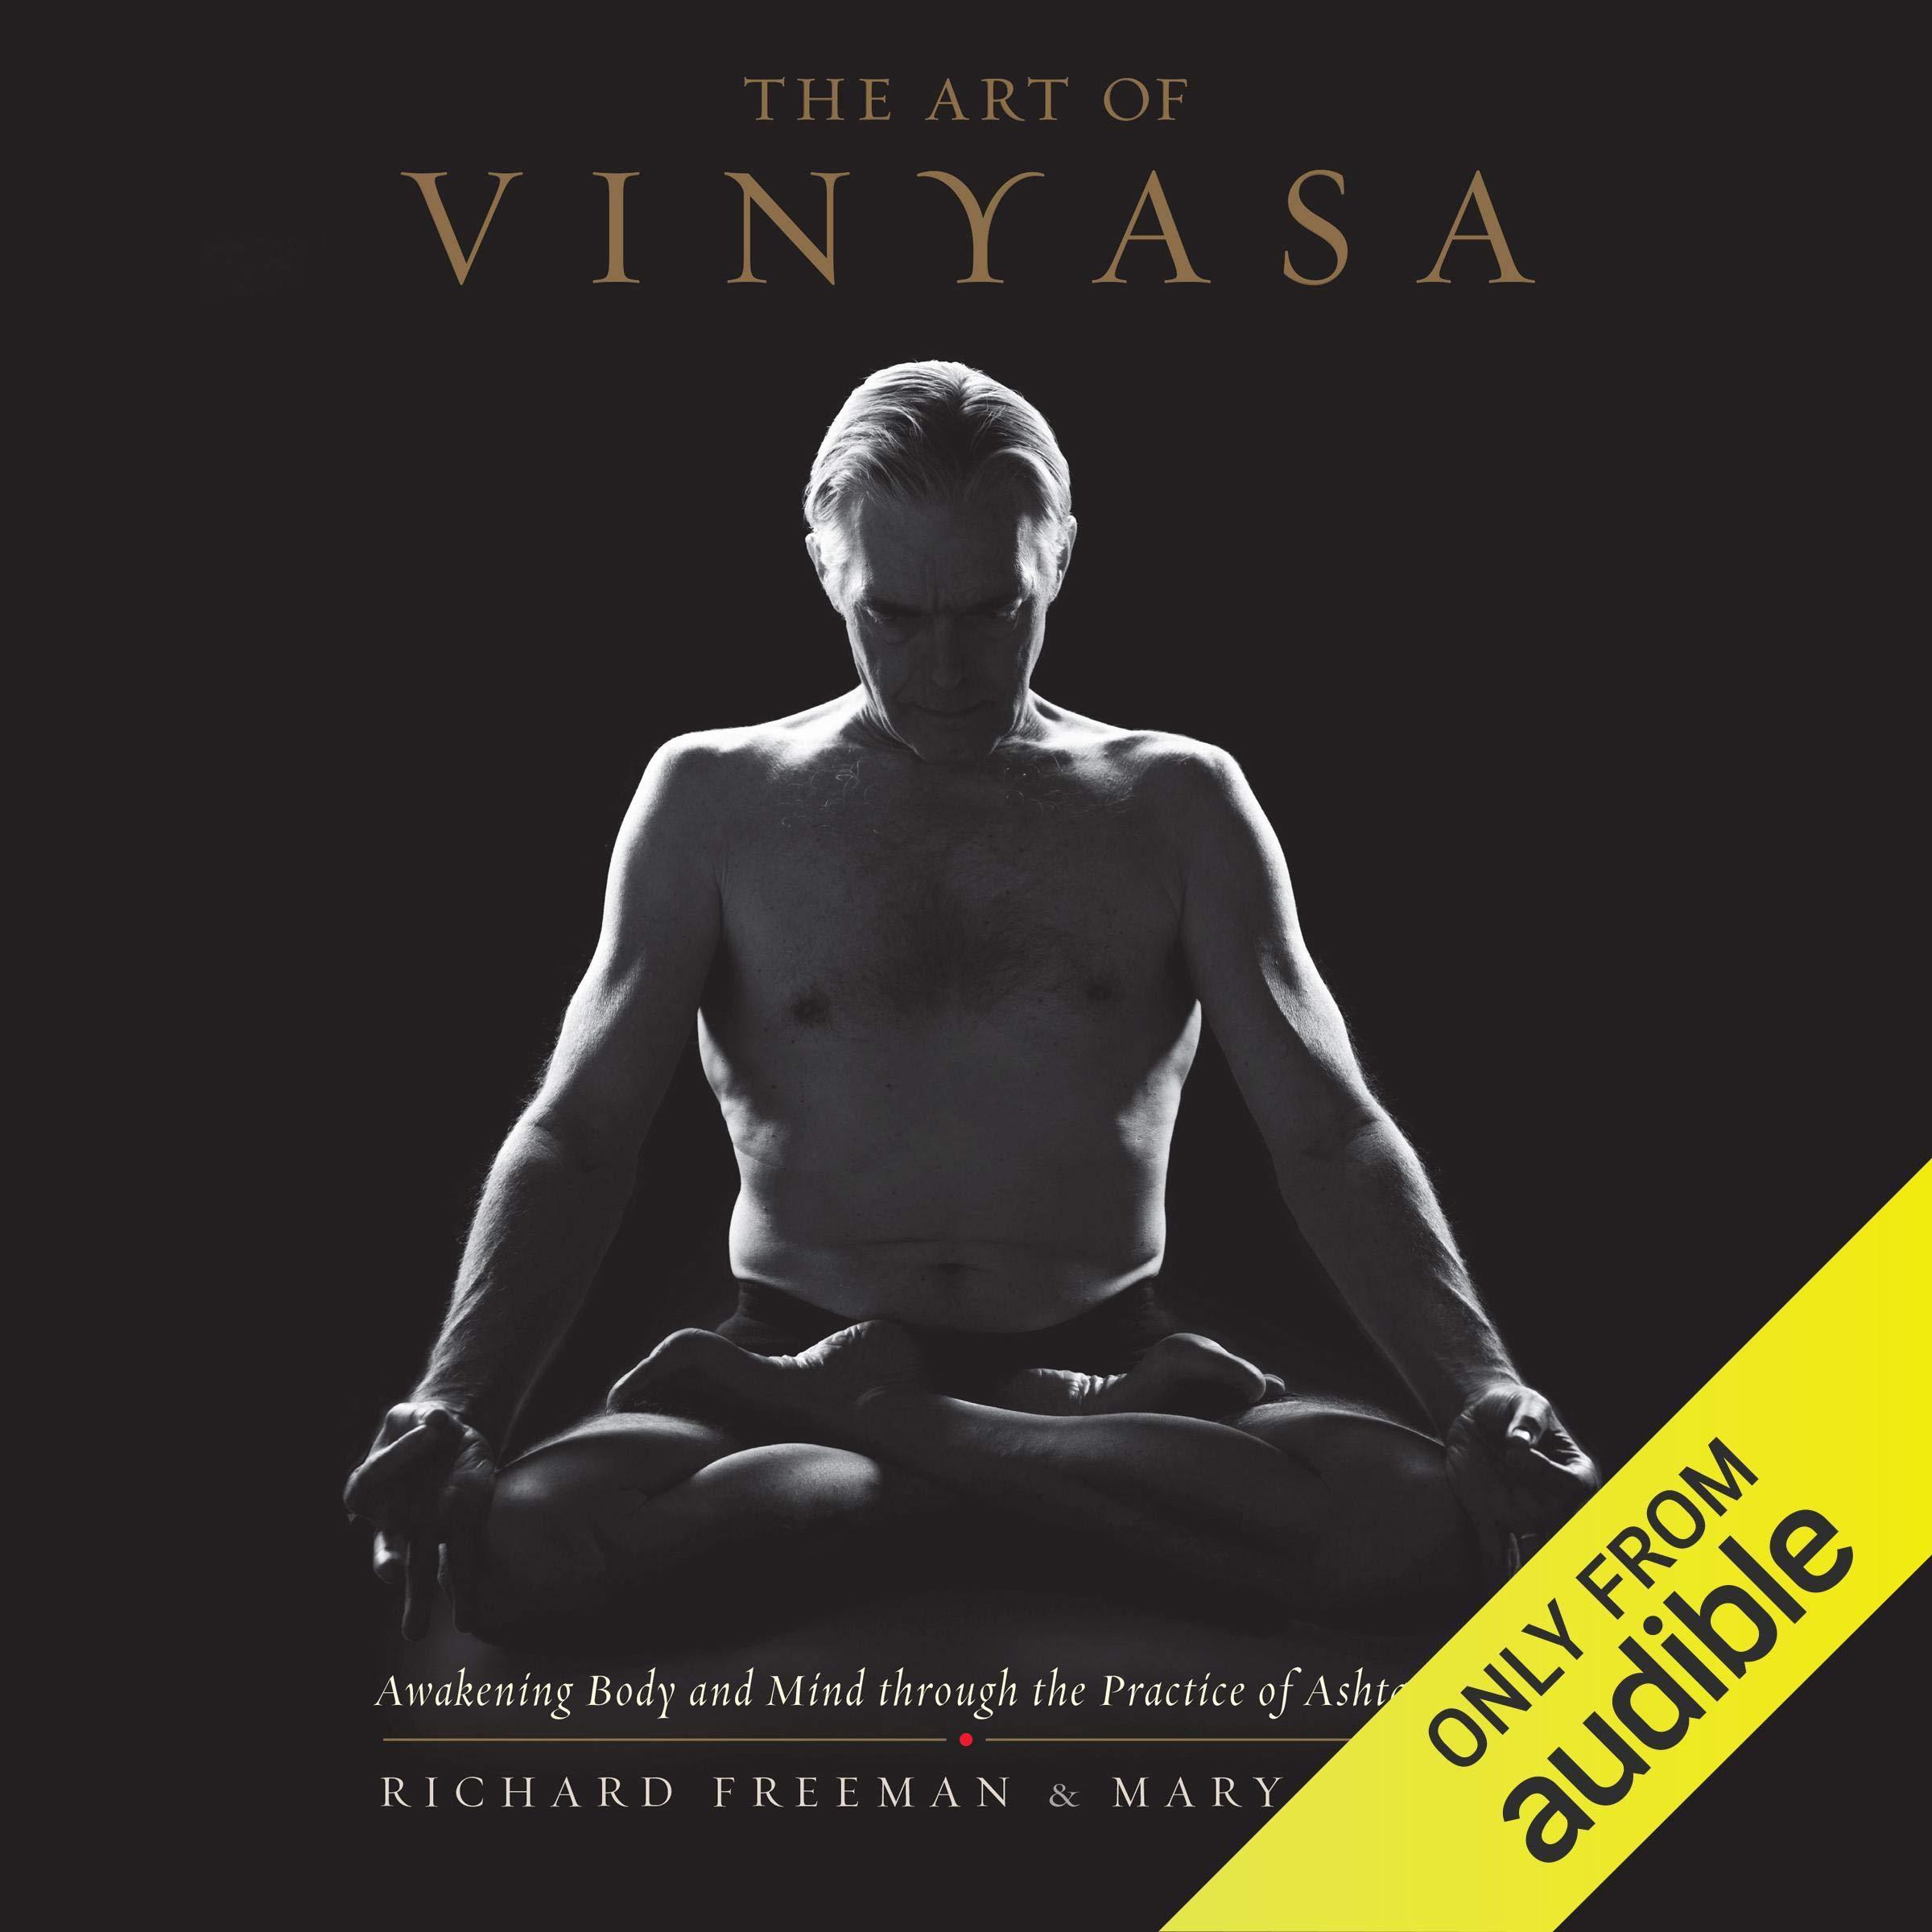 The Art Of Vinyasa  Awakening Body And Mind Through The Practice Of Ashtanga Yoga